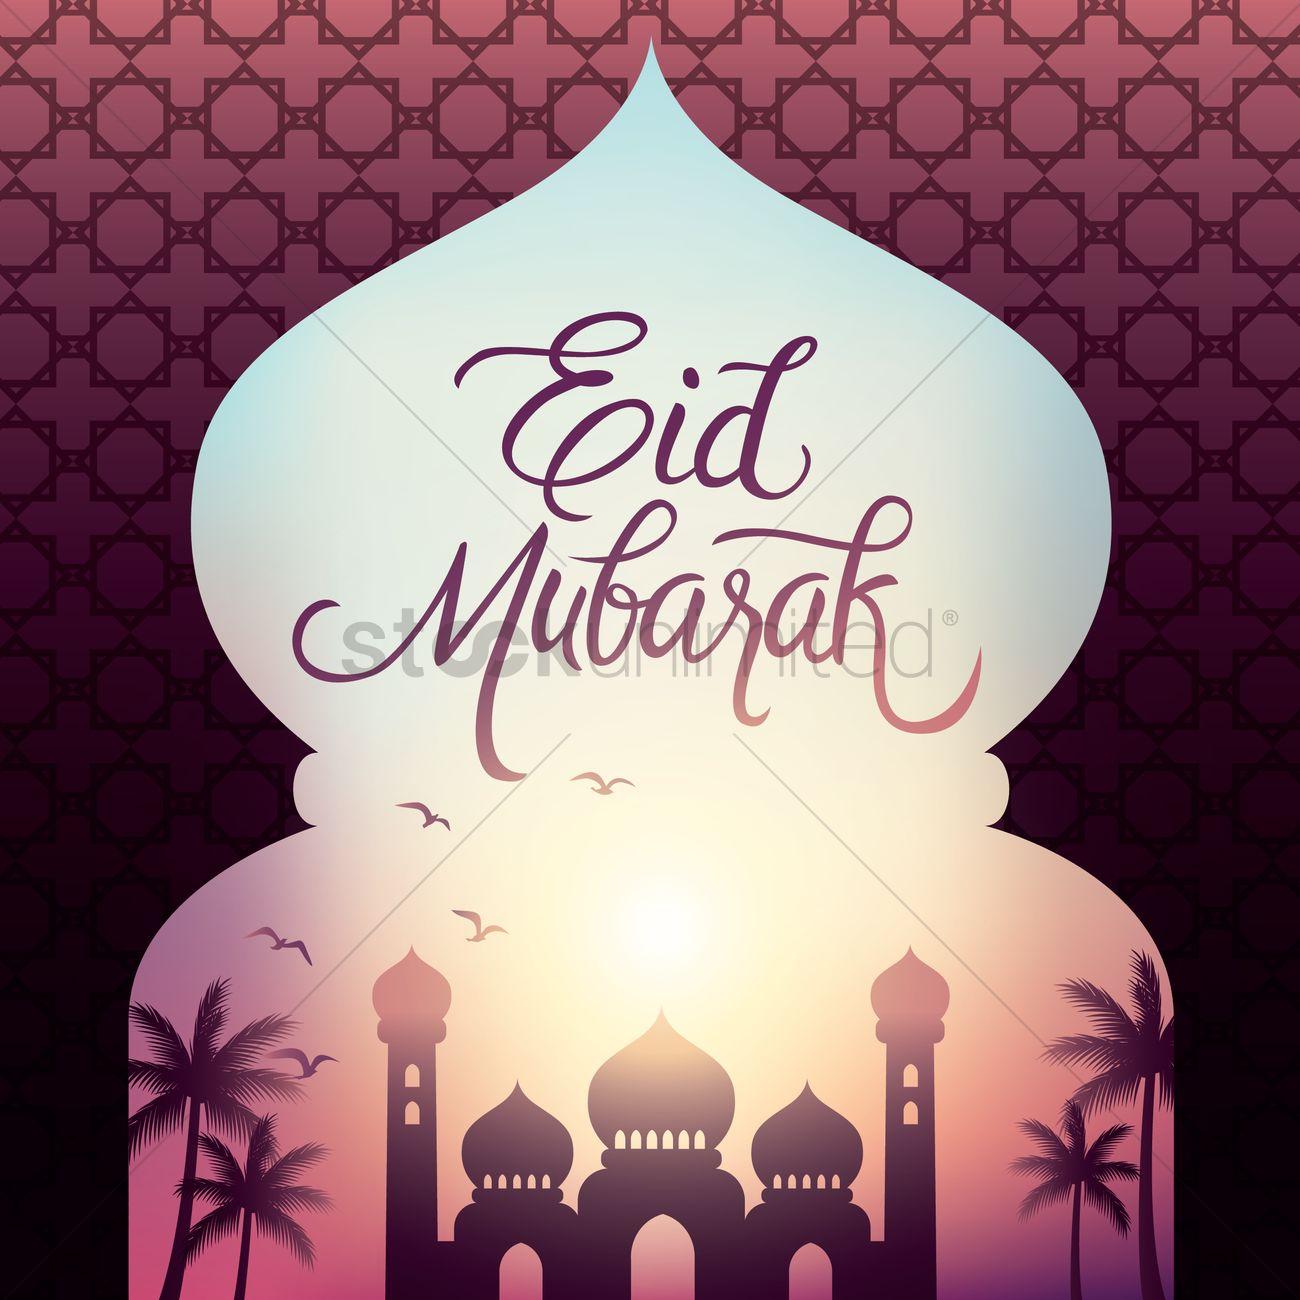 Eid Mubarak Design Vector Image 1964195 Stockunlimited